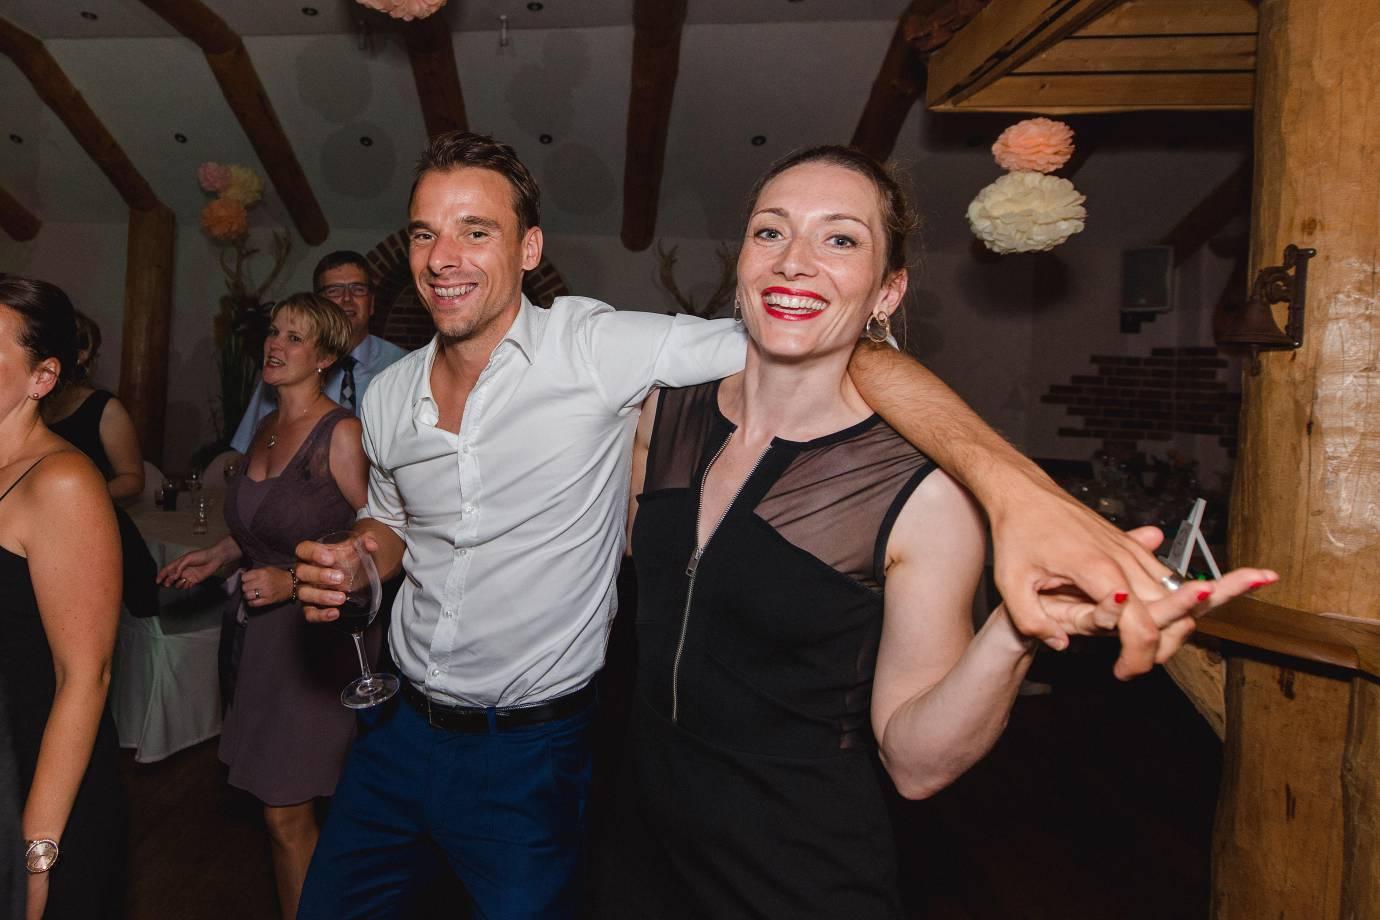 hochzeitsfotograf ganderkesee 234 - Christina+Andreas